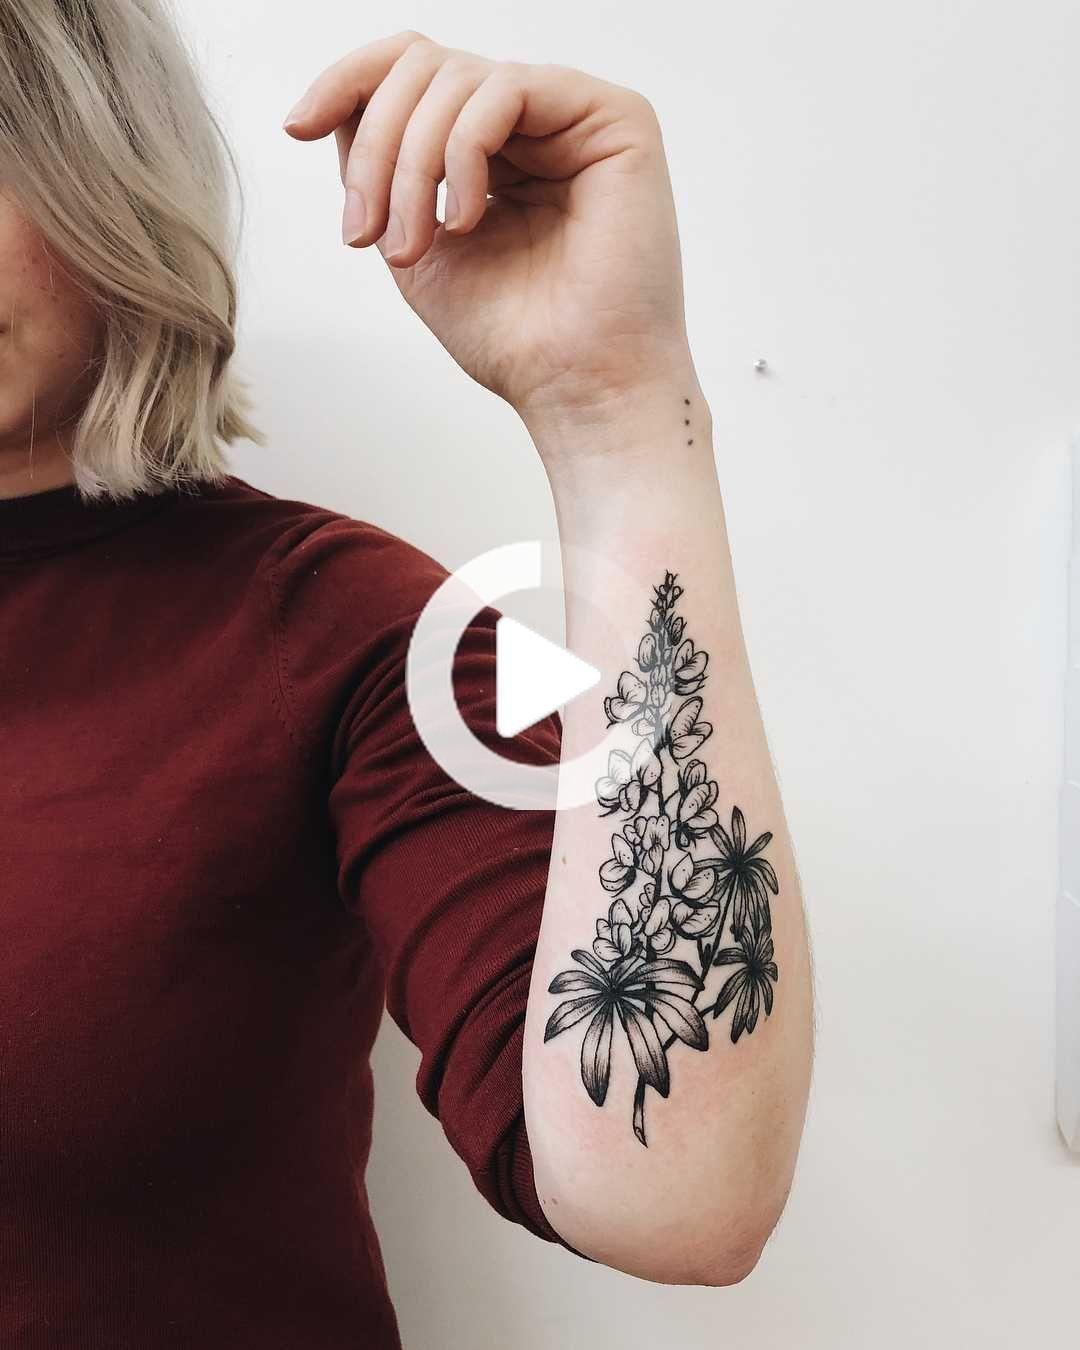 Texas bluebonnet tattoo - Tattoogrid.net